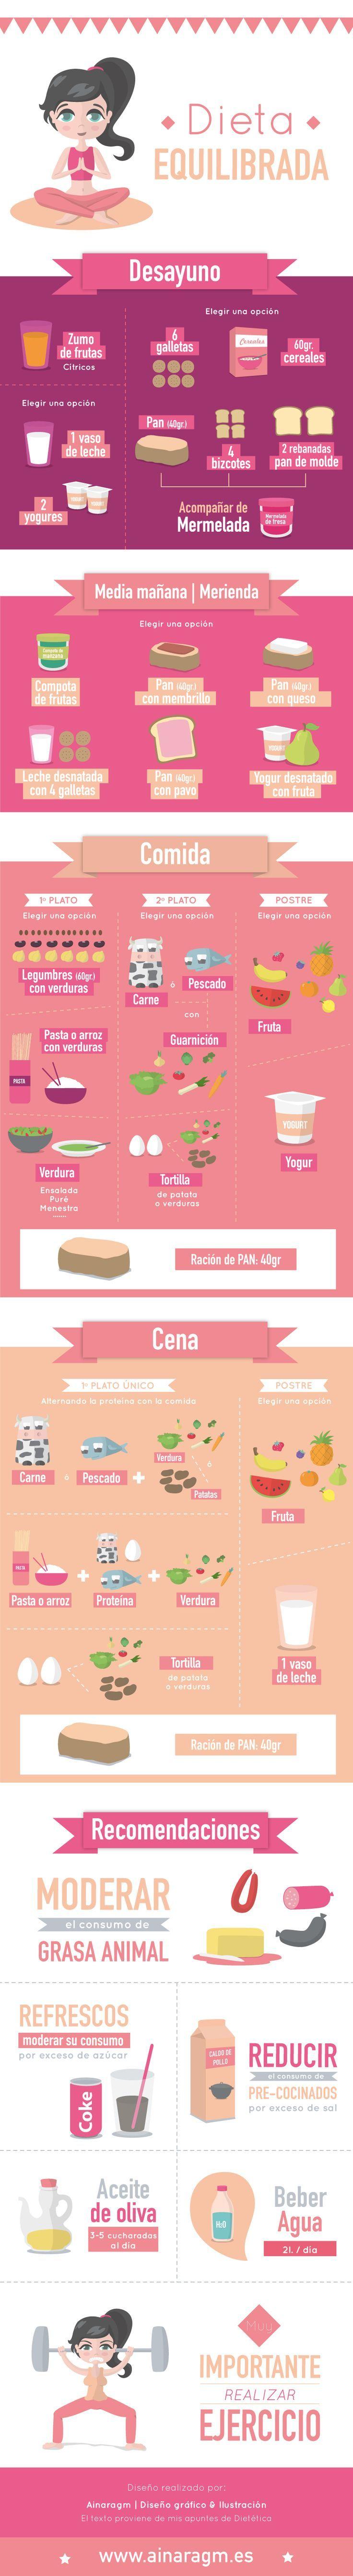 Como debe ser una dieta equilibrada #infografia #salud #health